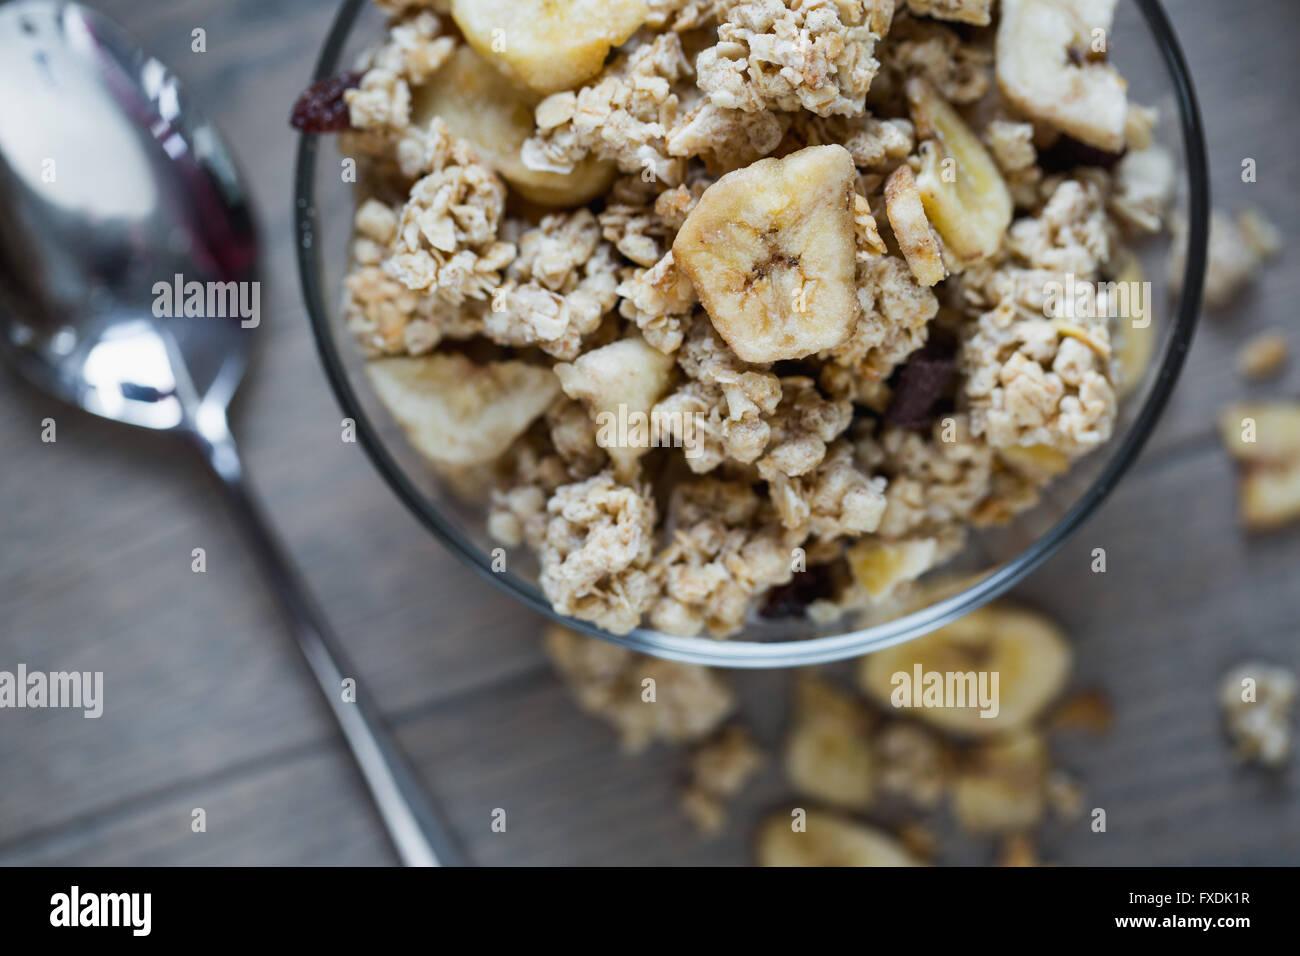 Plato de granola con plátano sobre mesa de madera. Imagen De Stock